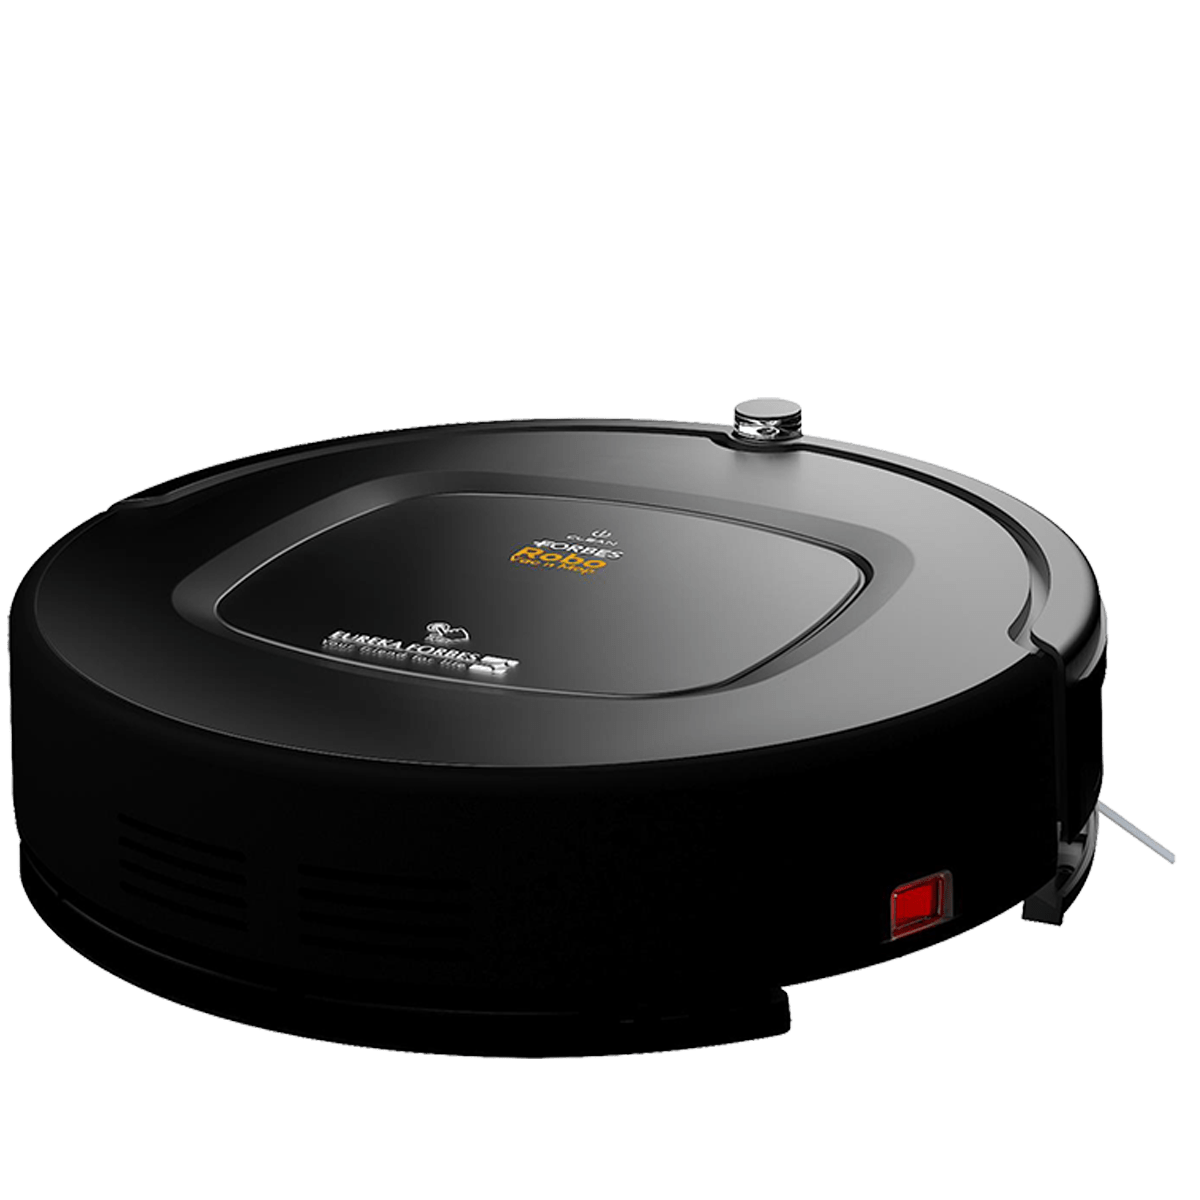 Eureka Forbes Robo Vac n Mop 16 Watts Robotic Vacuum Cleaner (0.5 Liters Tank, GFCDFRCLN00000, Black)_1